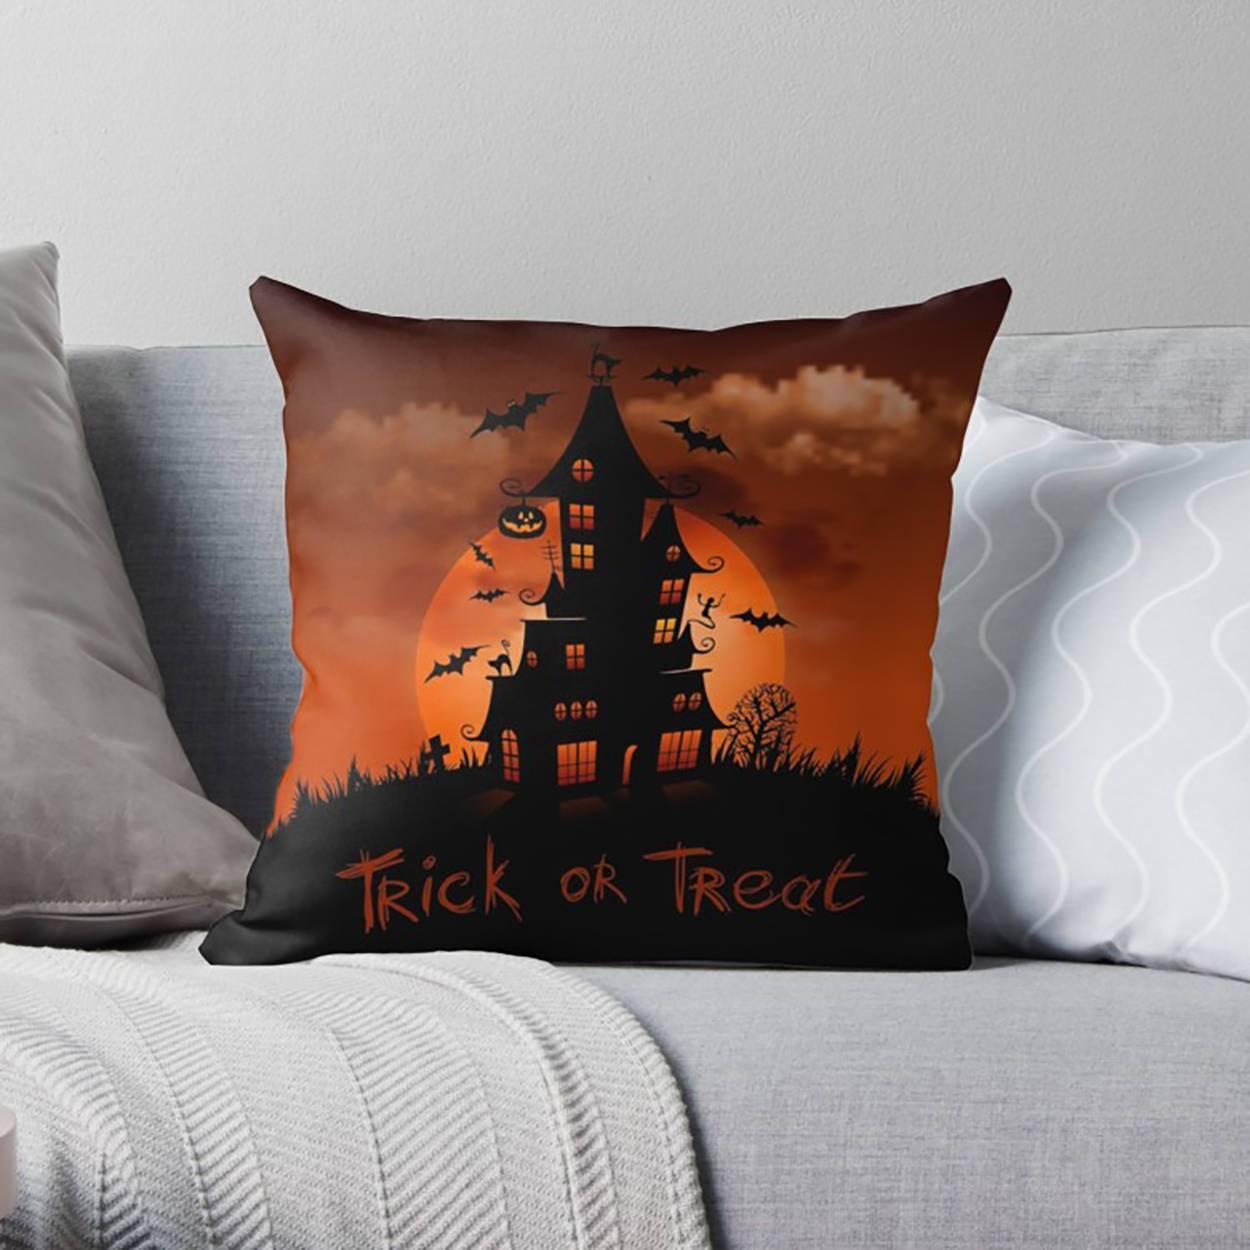 Halloween Decorative Pillow Pillows, Halloween pillows